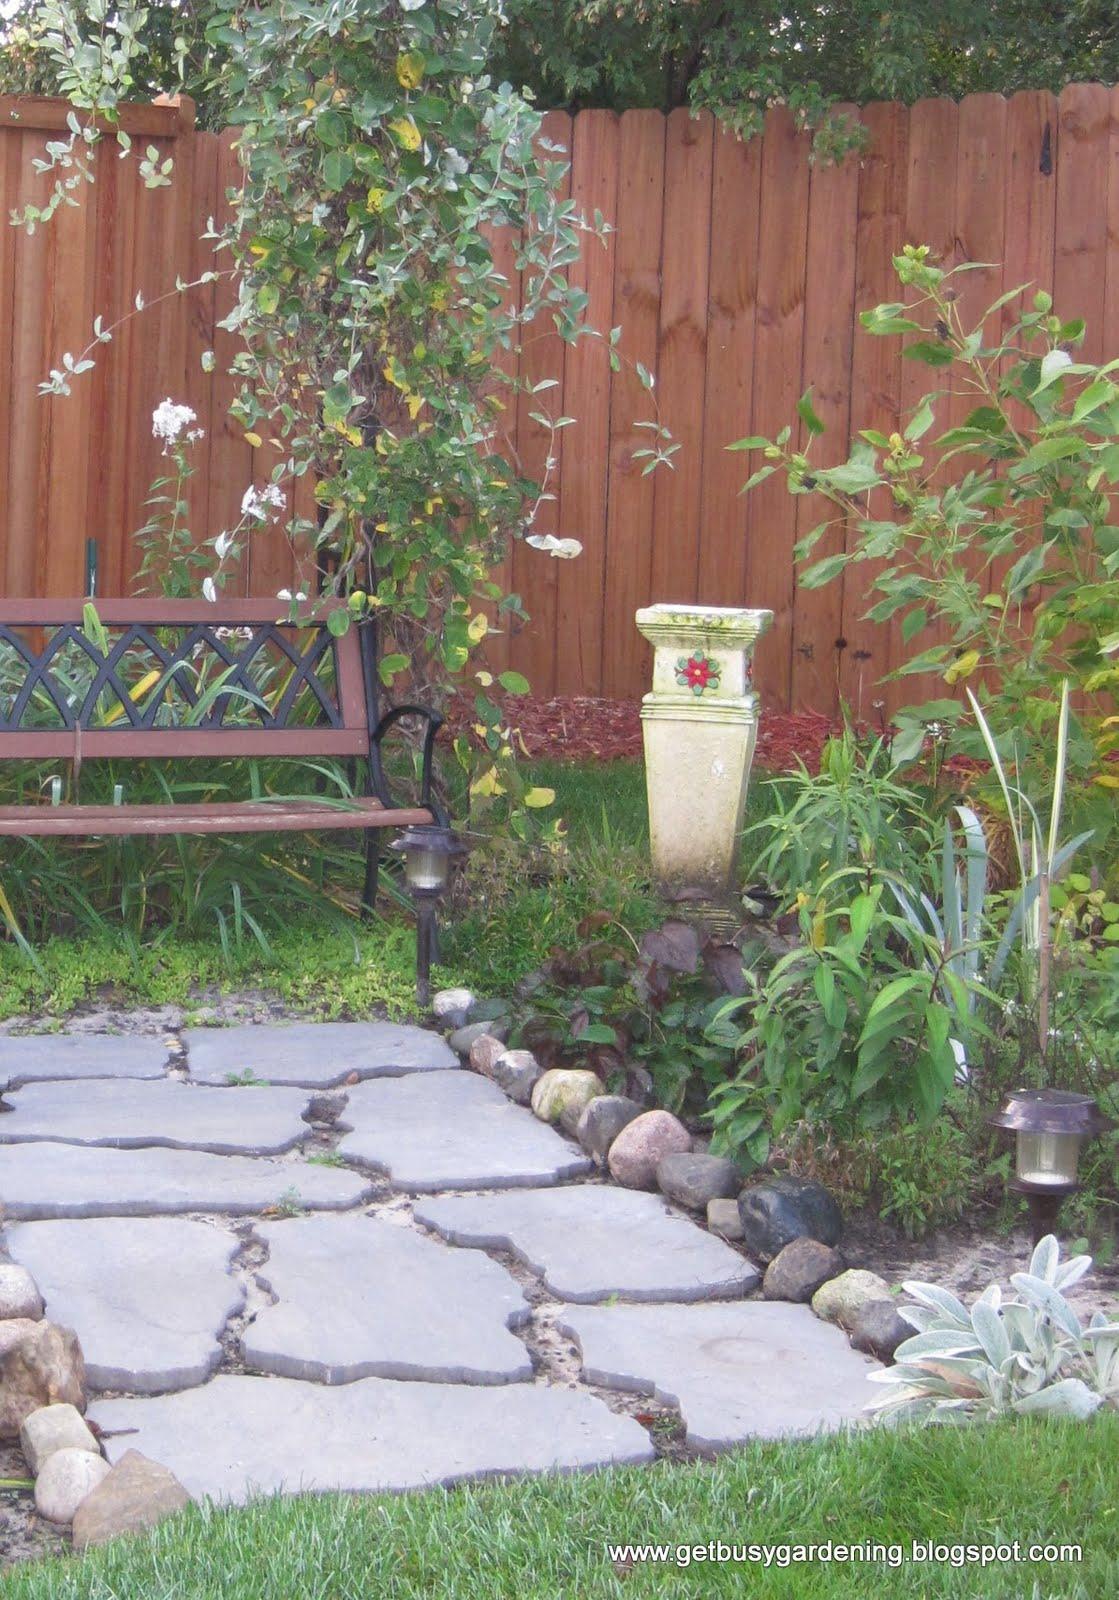 10 ways to reuse junk in the garden get busy gardening. Black Bedroom Furniture Sets. Home Design Ideas